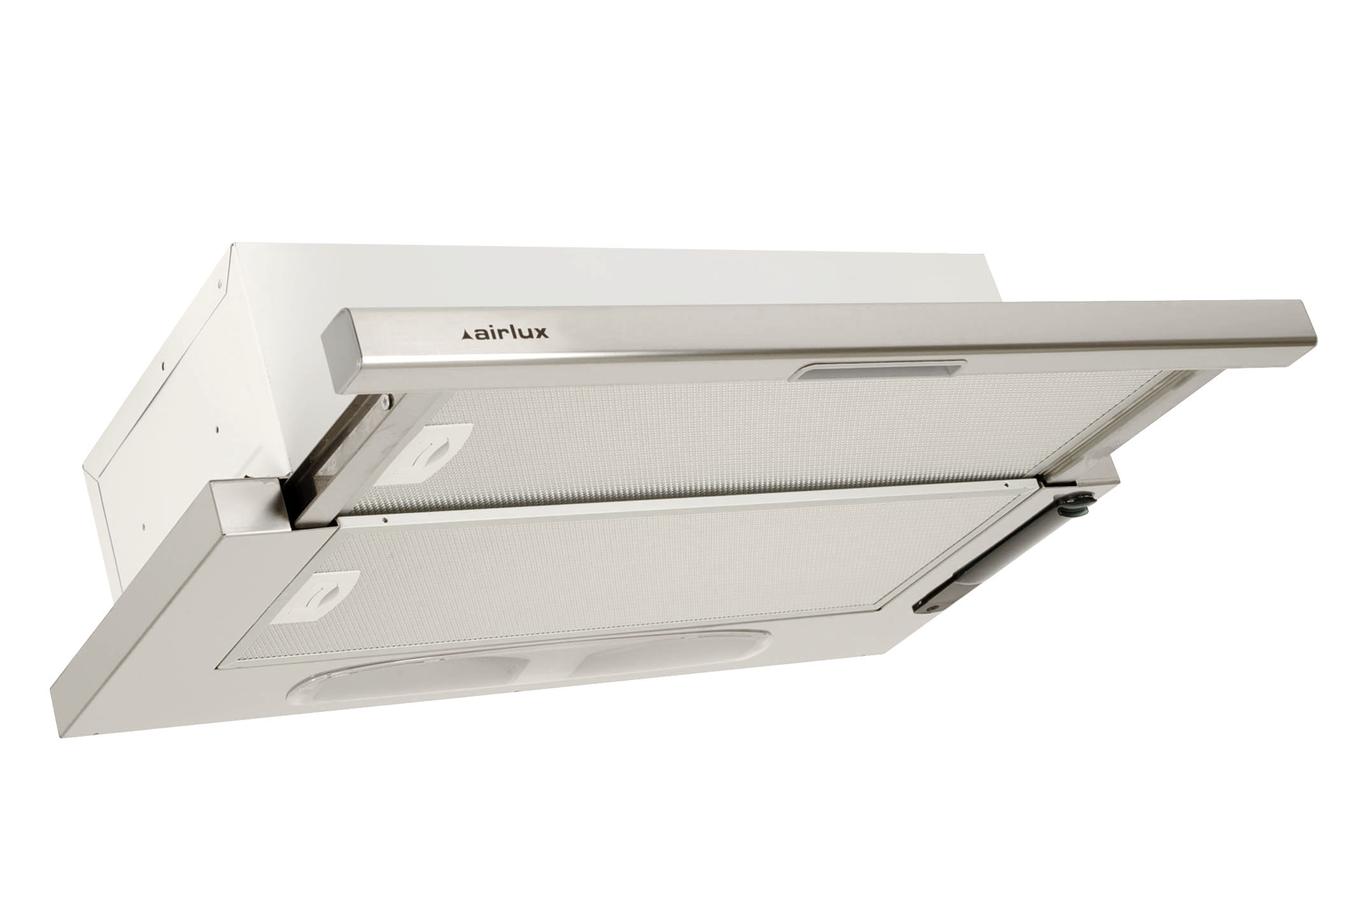 hotte tiroir airlux ht20c inox ht20c inox 2803852 darty. Black Bedroom Furniture Sets. Home Design Ideas